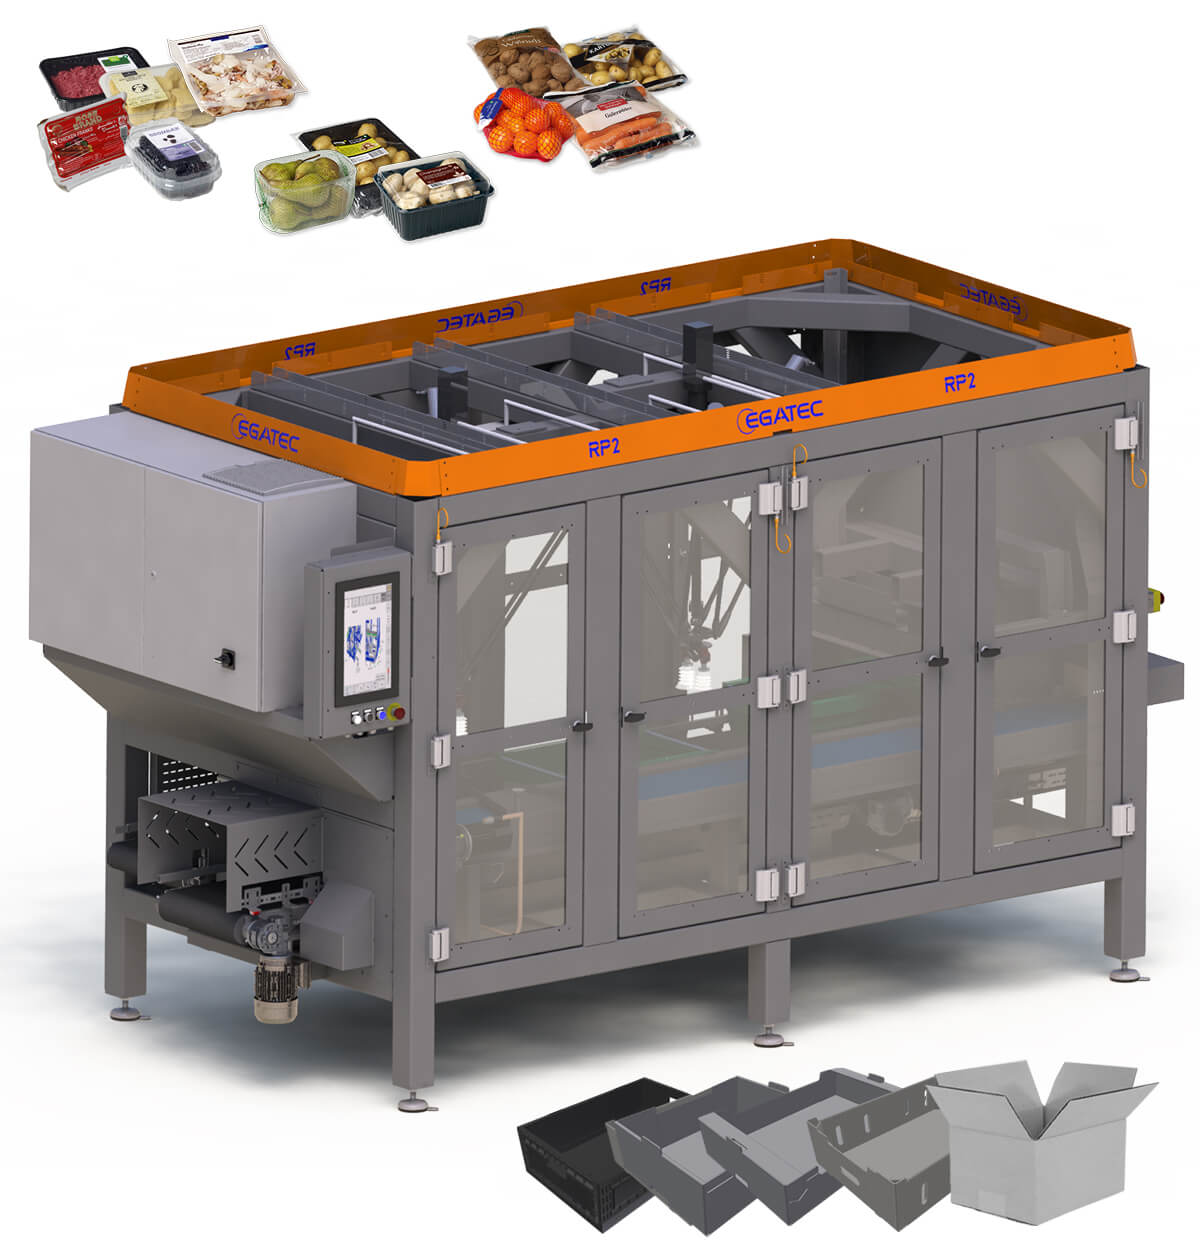 Robot packaging machine